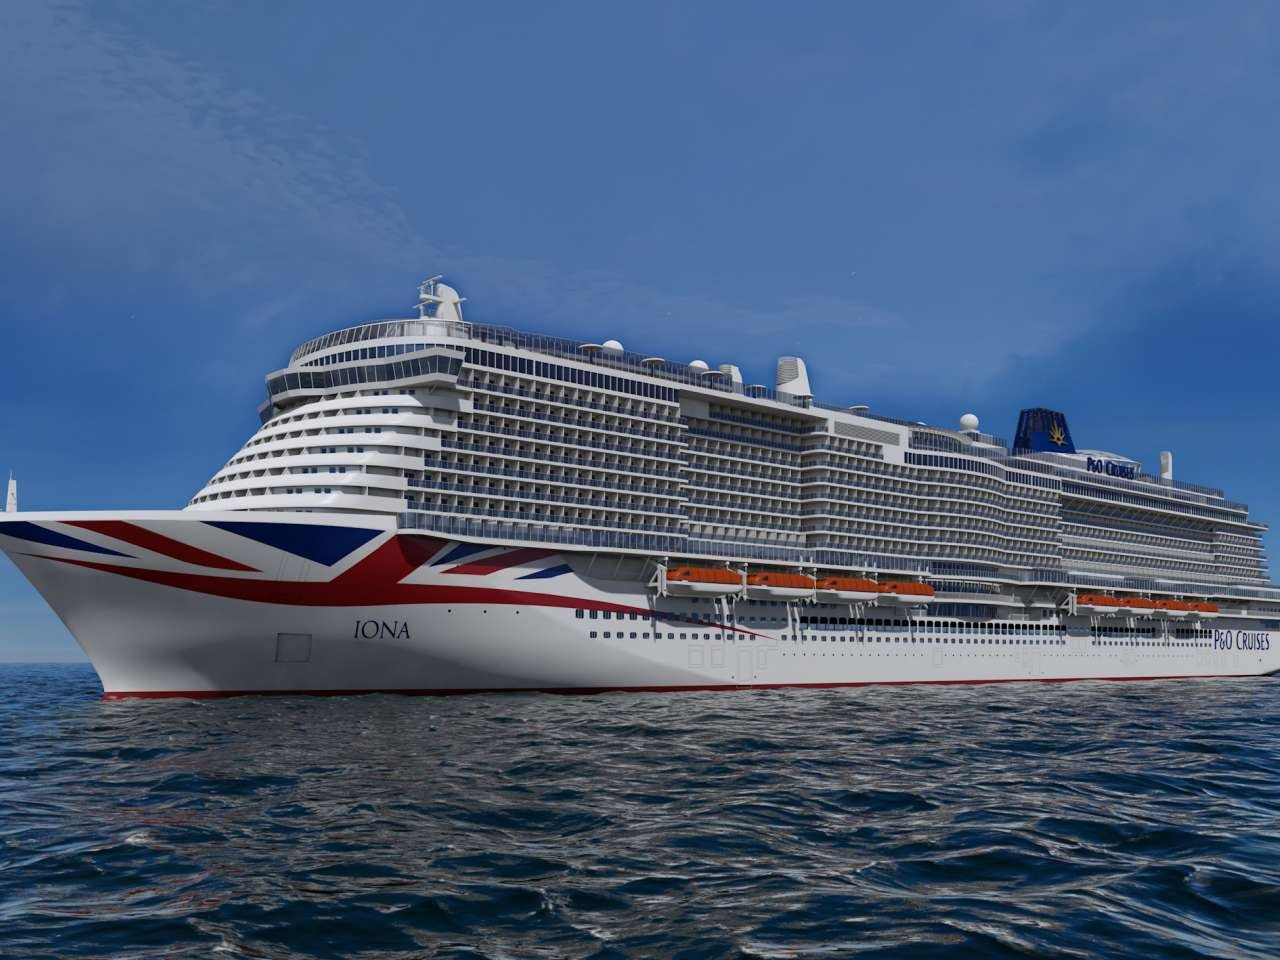 Iona Cruise Ship & Cruise Deals | P&o Cruises P&o Cruise Calendar 2019